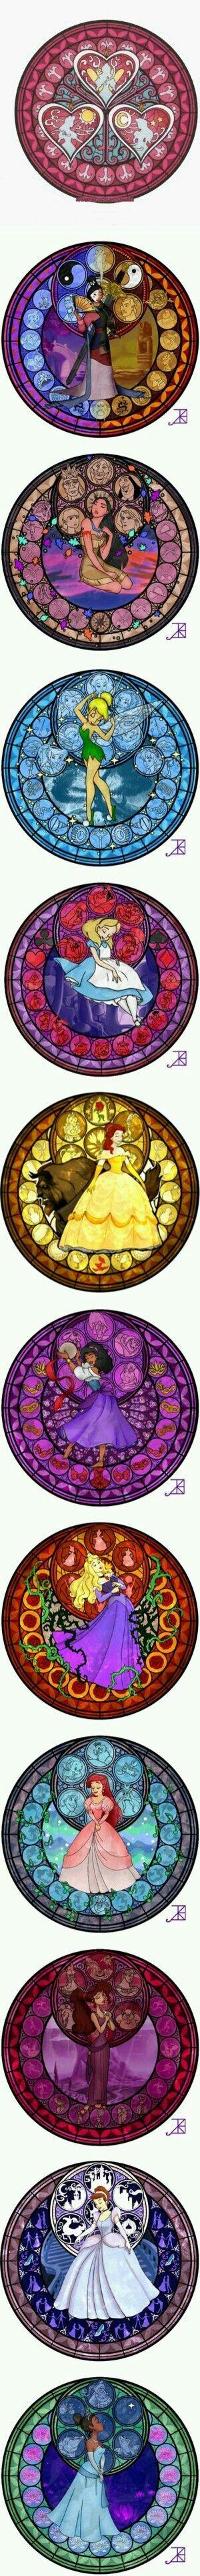 Kingdom hearts princess